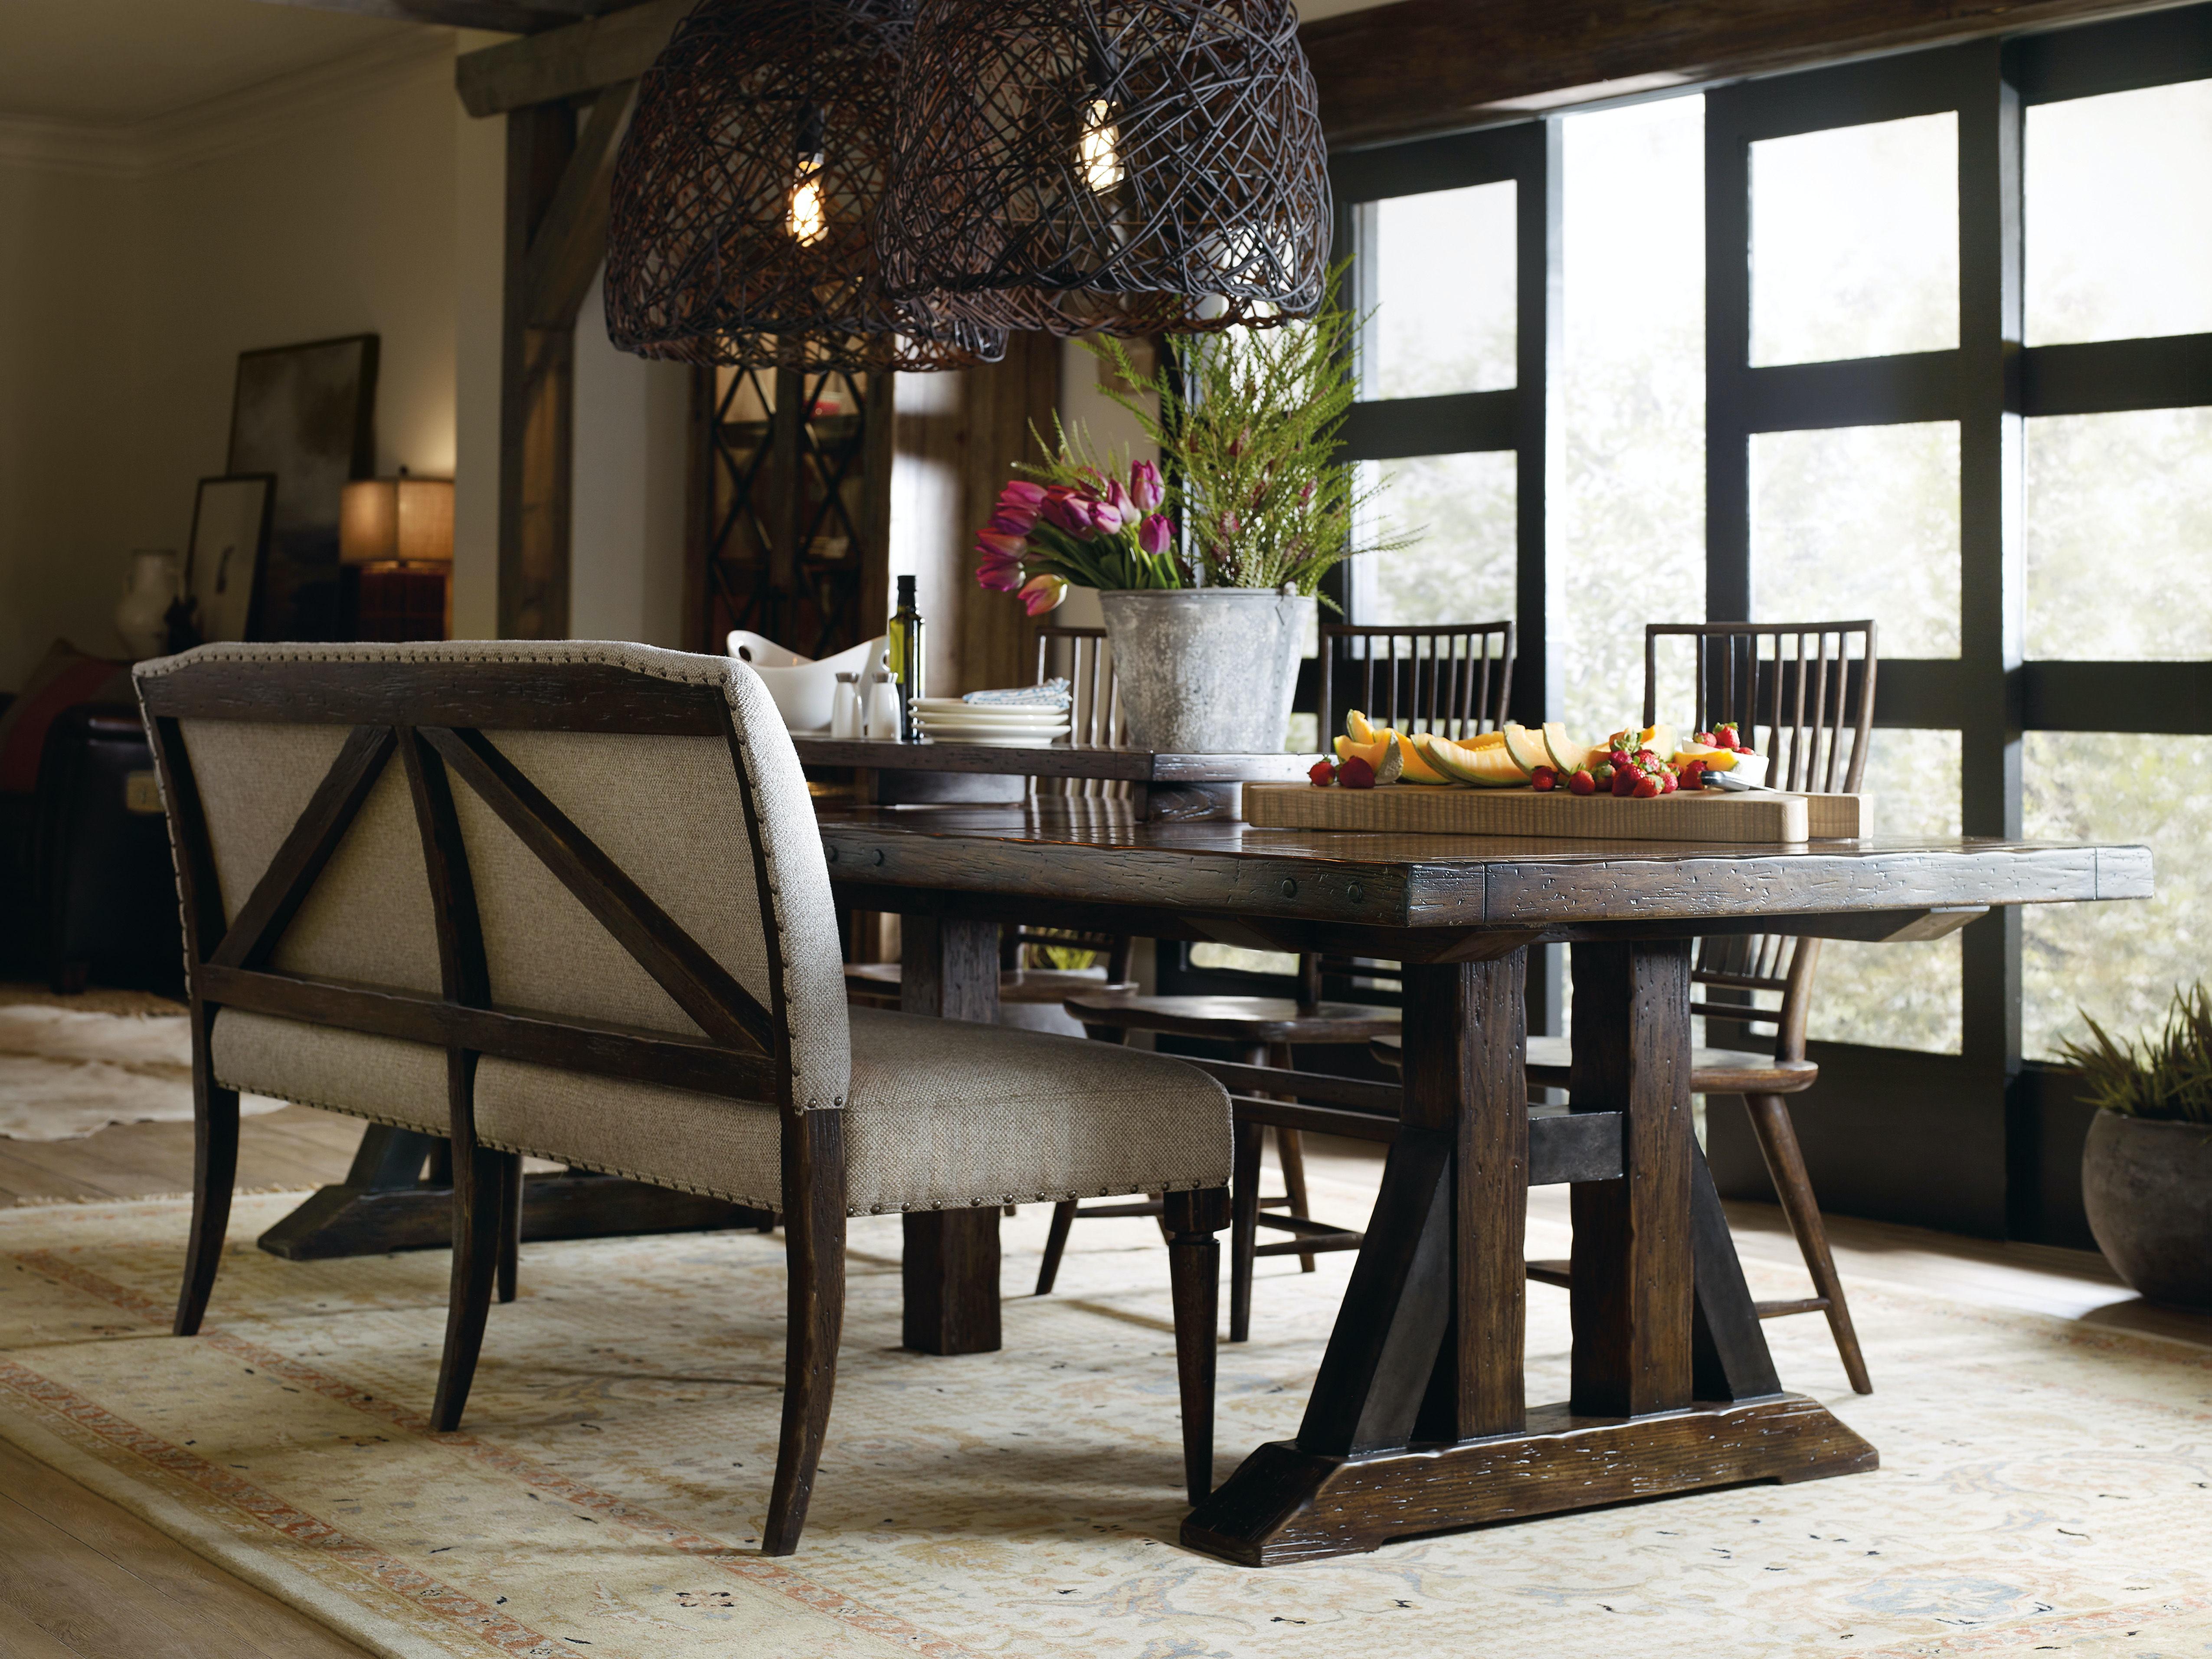 Hooker Furniture Roslyn County Upholstered Dining Bench 1618 75019 DKW